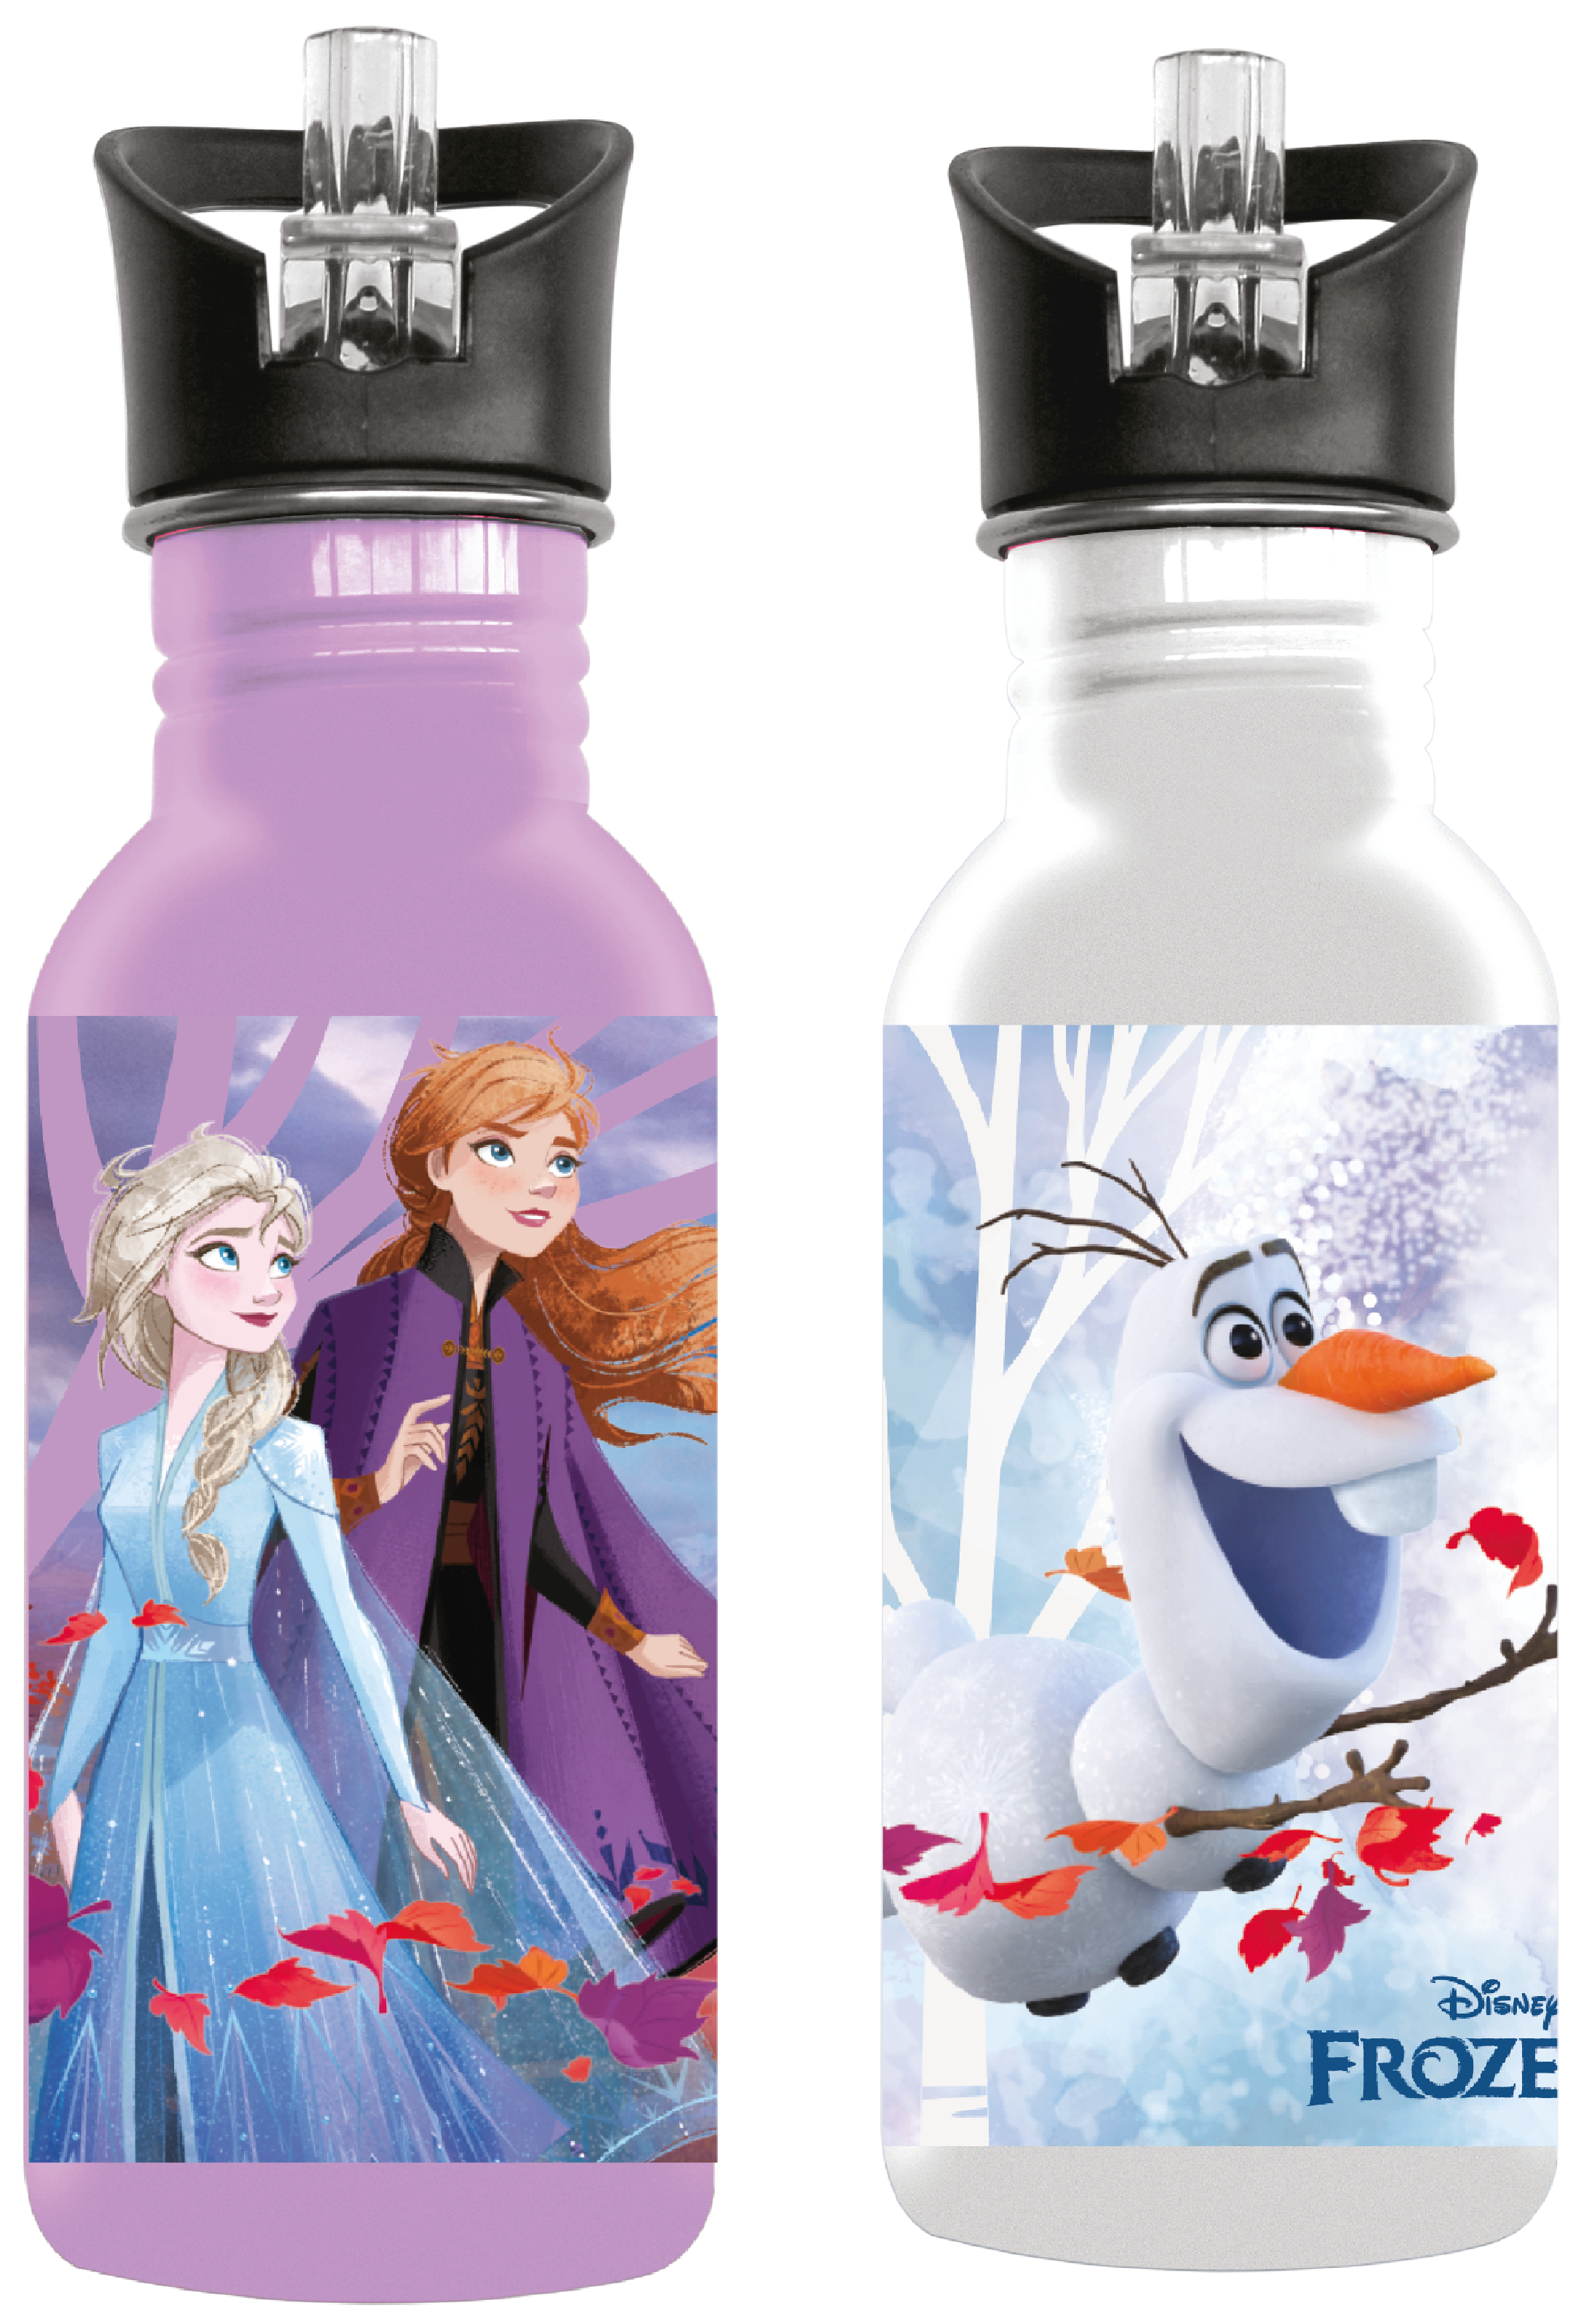 Disney Frozen Aluminium Drinking Bottles (You Get 1 of 2 Designs)